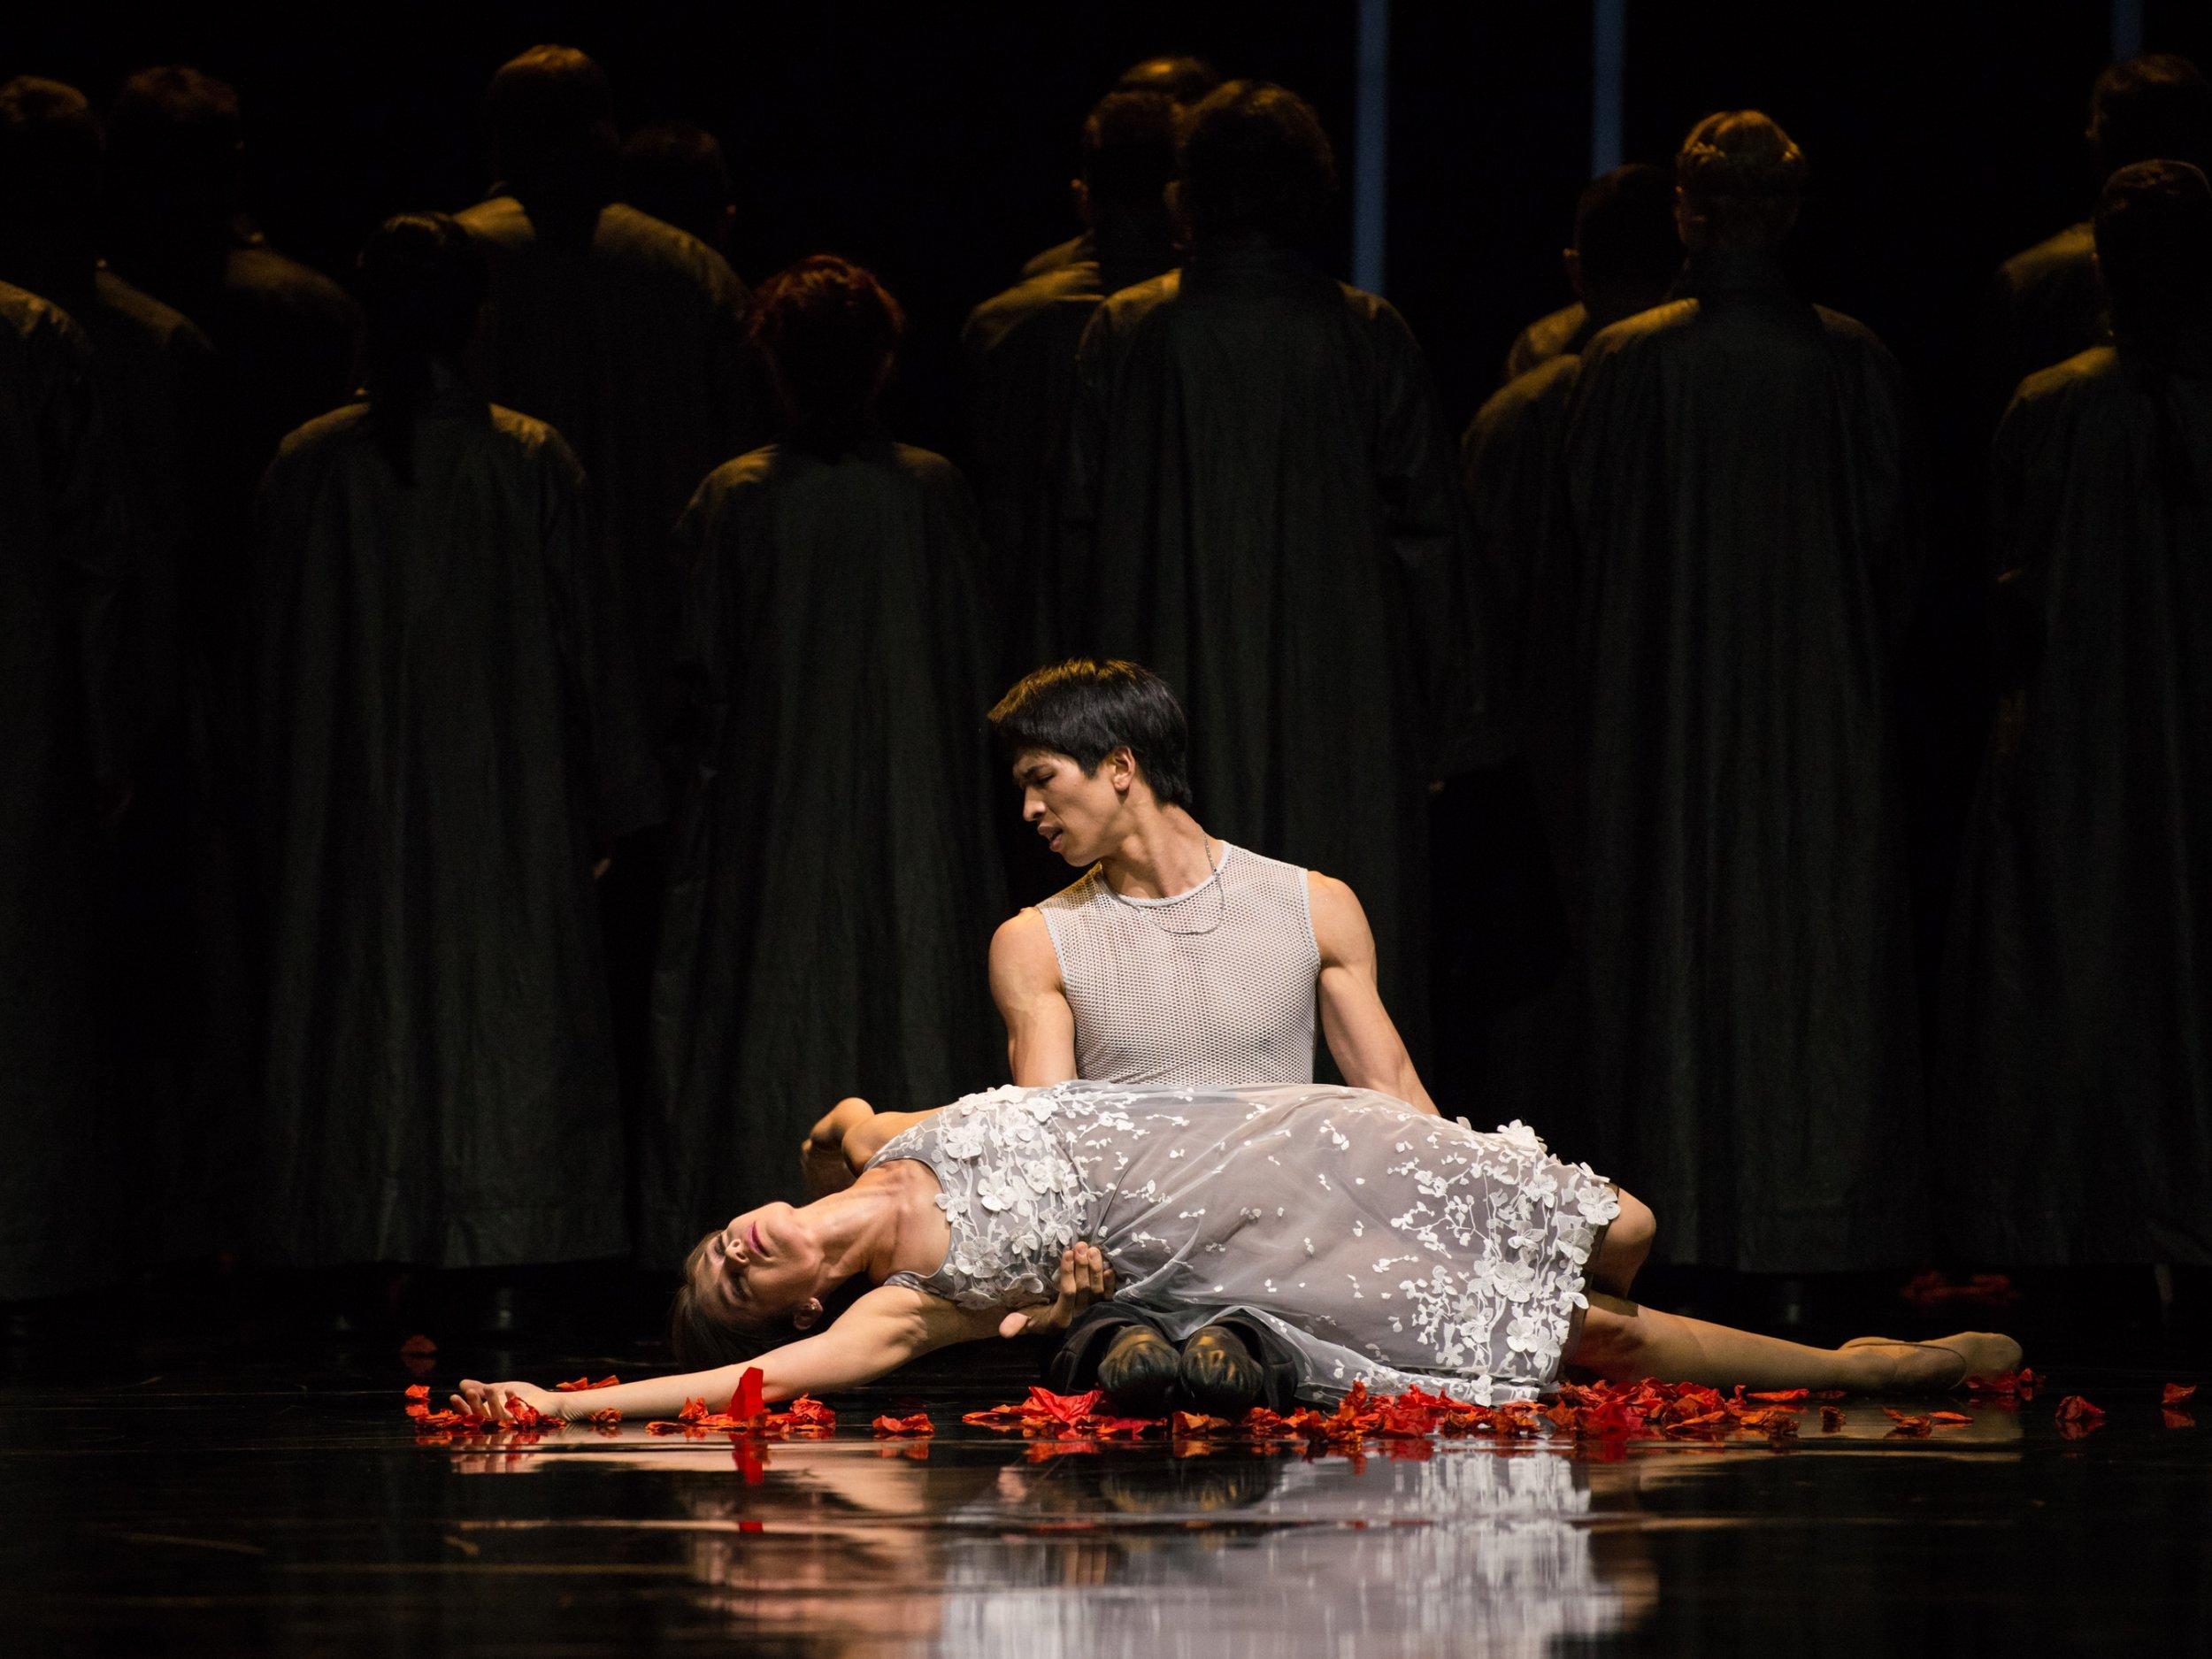 Masayu Kimoto / Maria Yakovleva  Copyright: Vienna State Ballet / Ashley Taylor